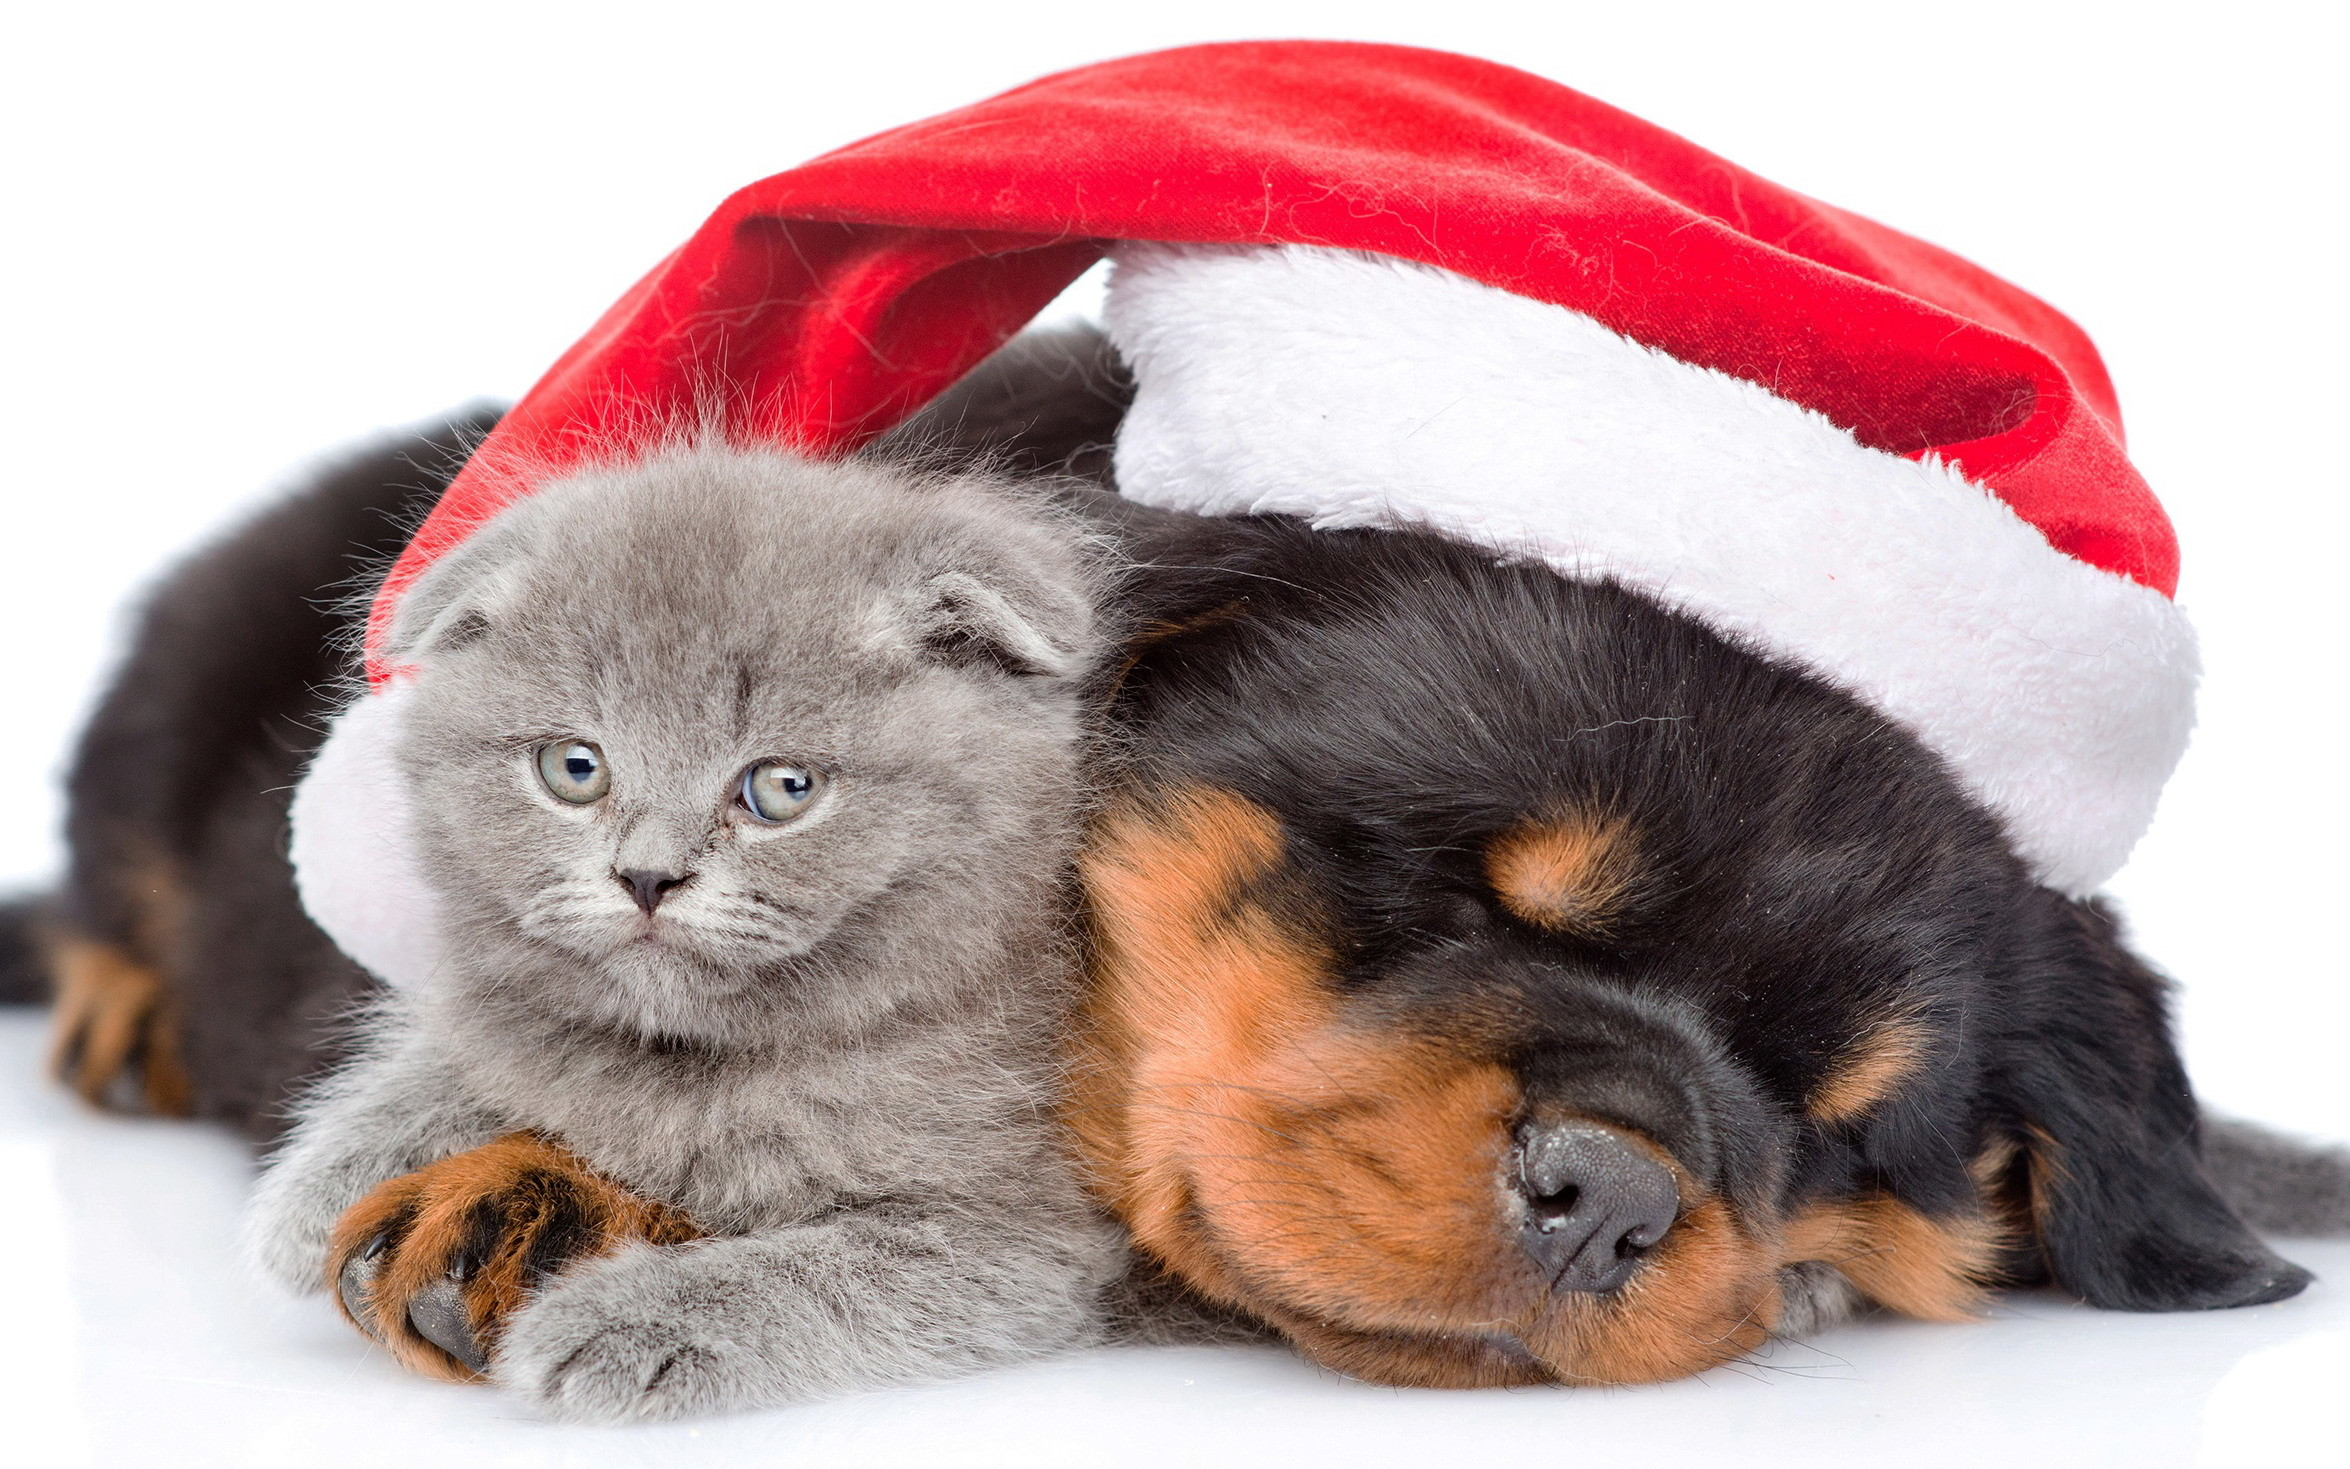 Animal – Cat & Dog Holiday Christmas Puppy Kitten Cute Santa Hat Wallpaper